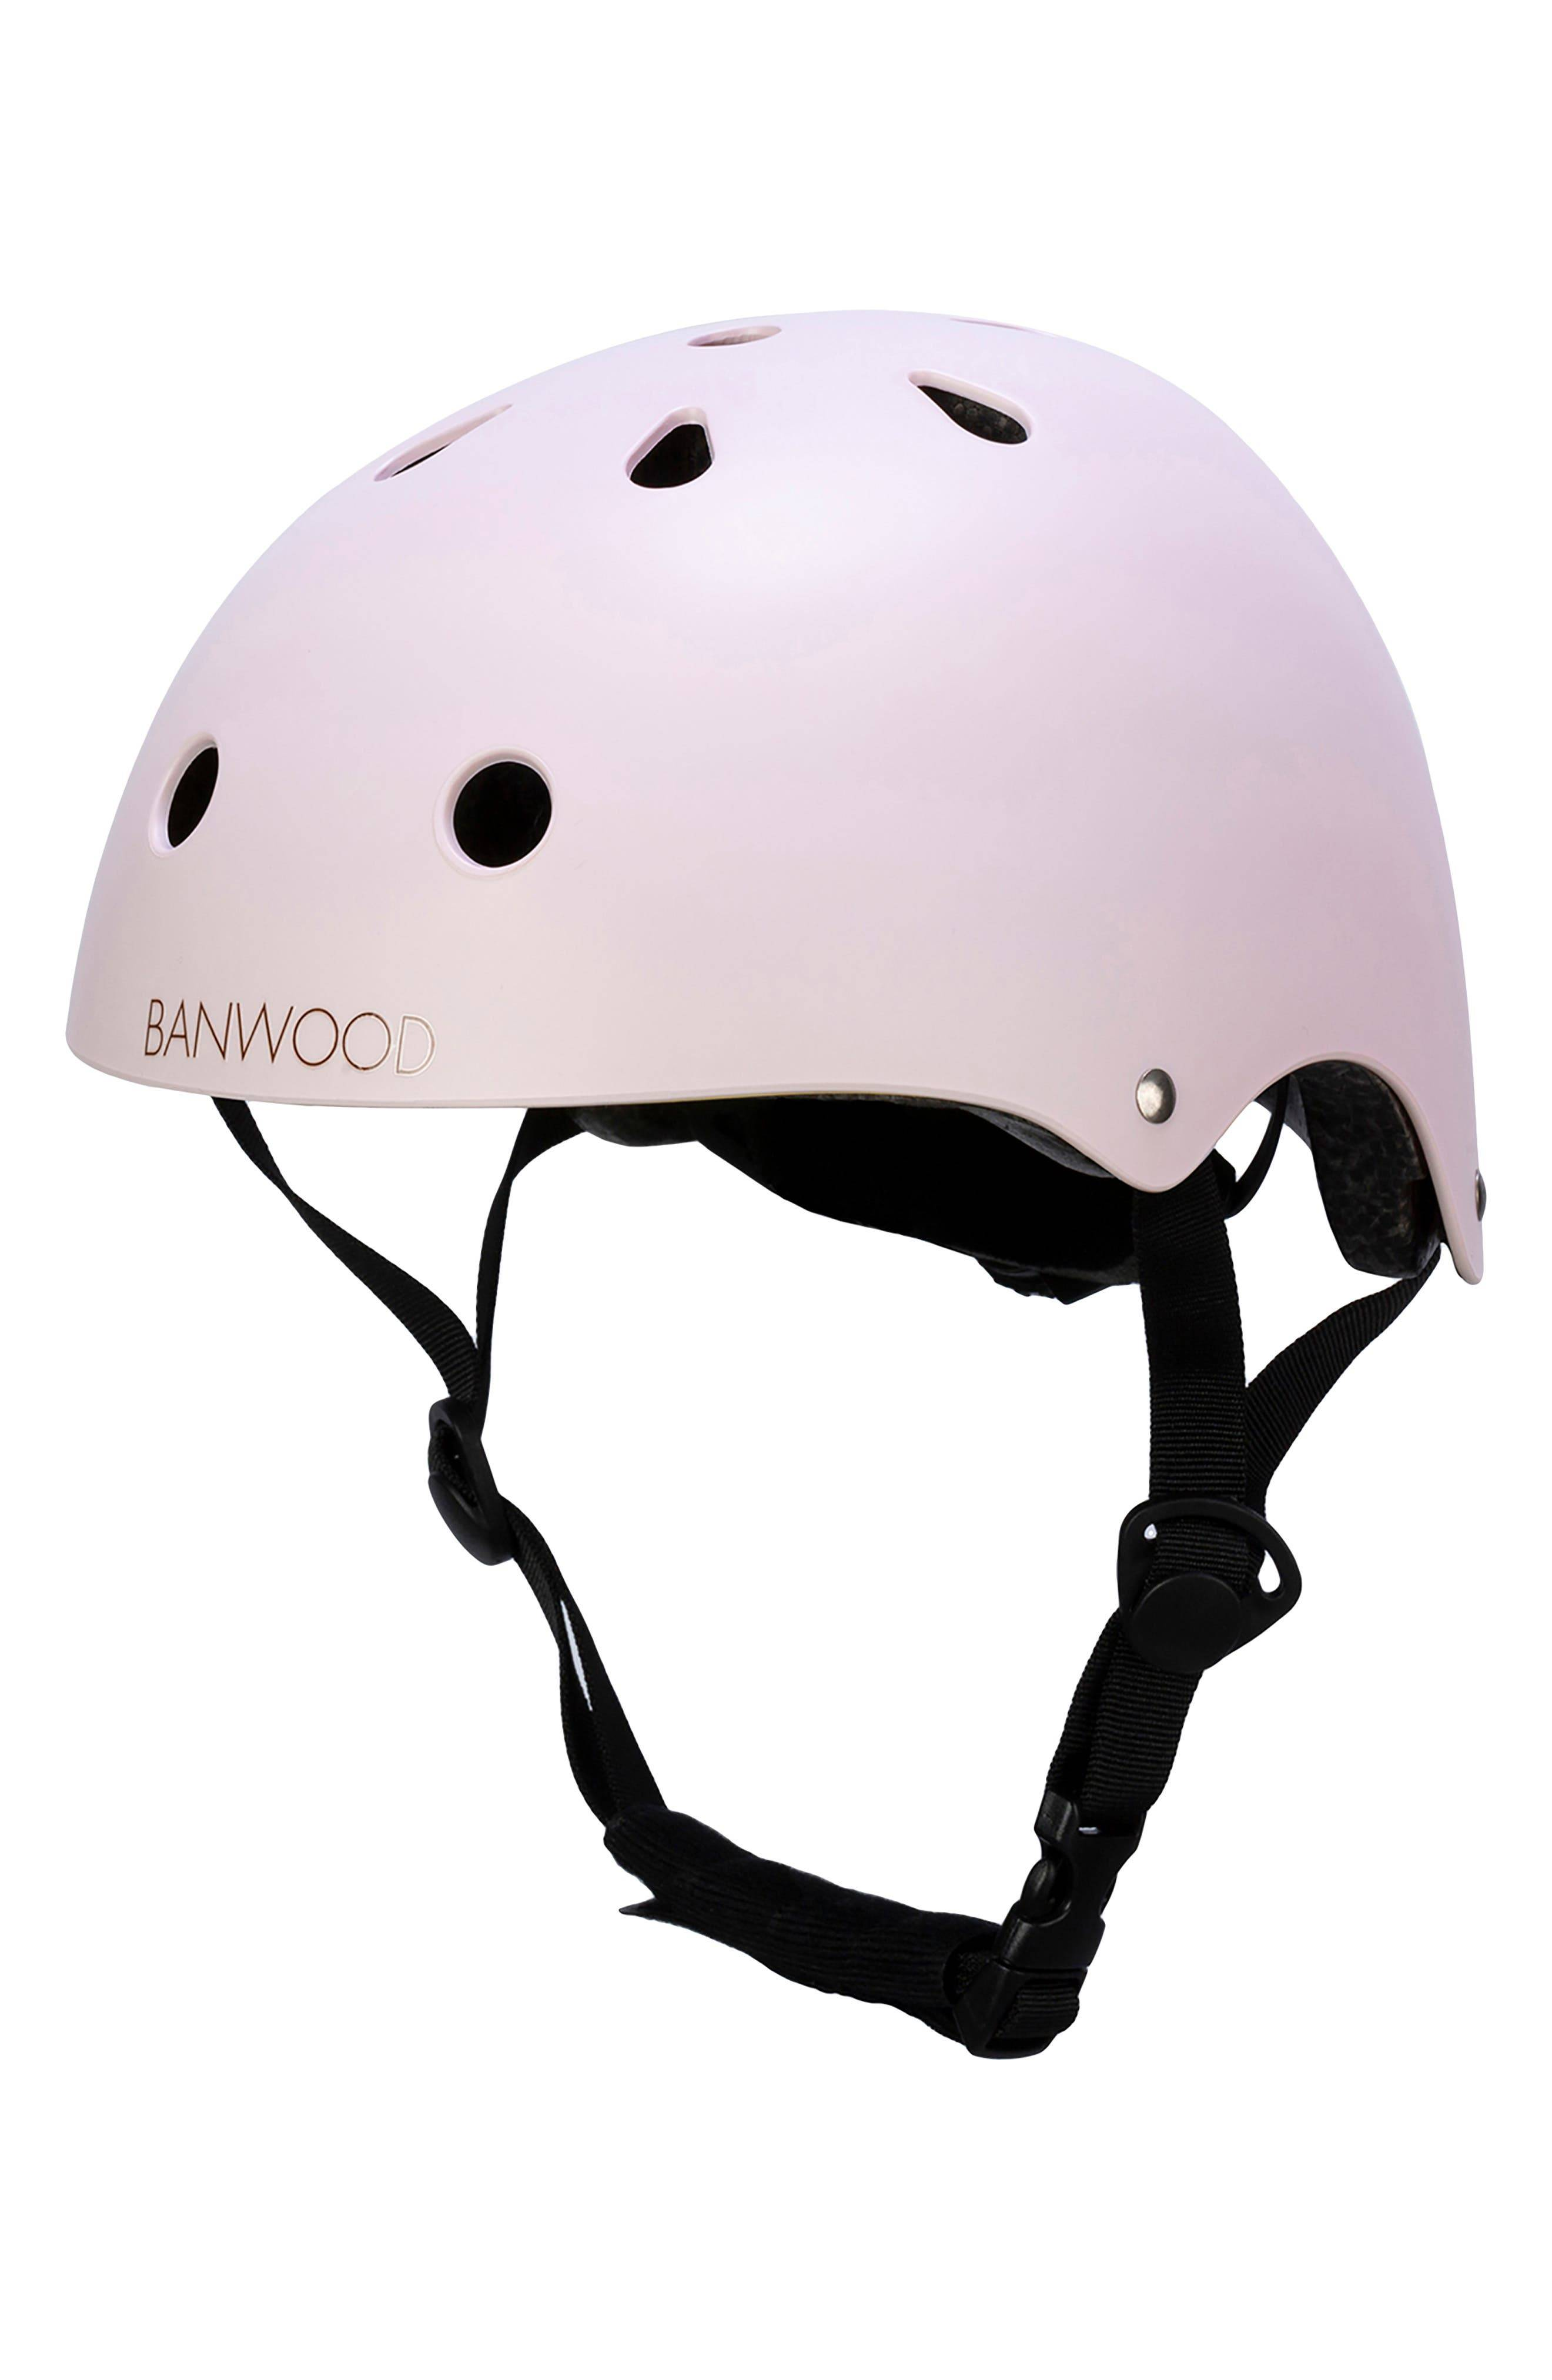 Banwood Bike Helmet - Pink